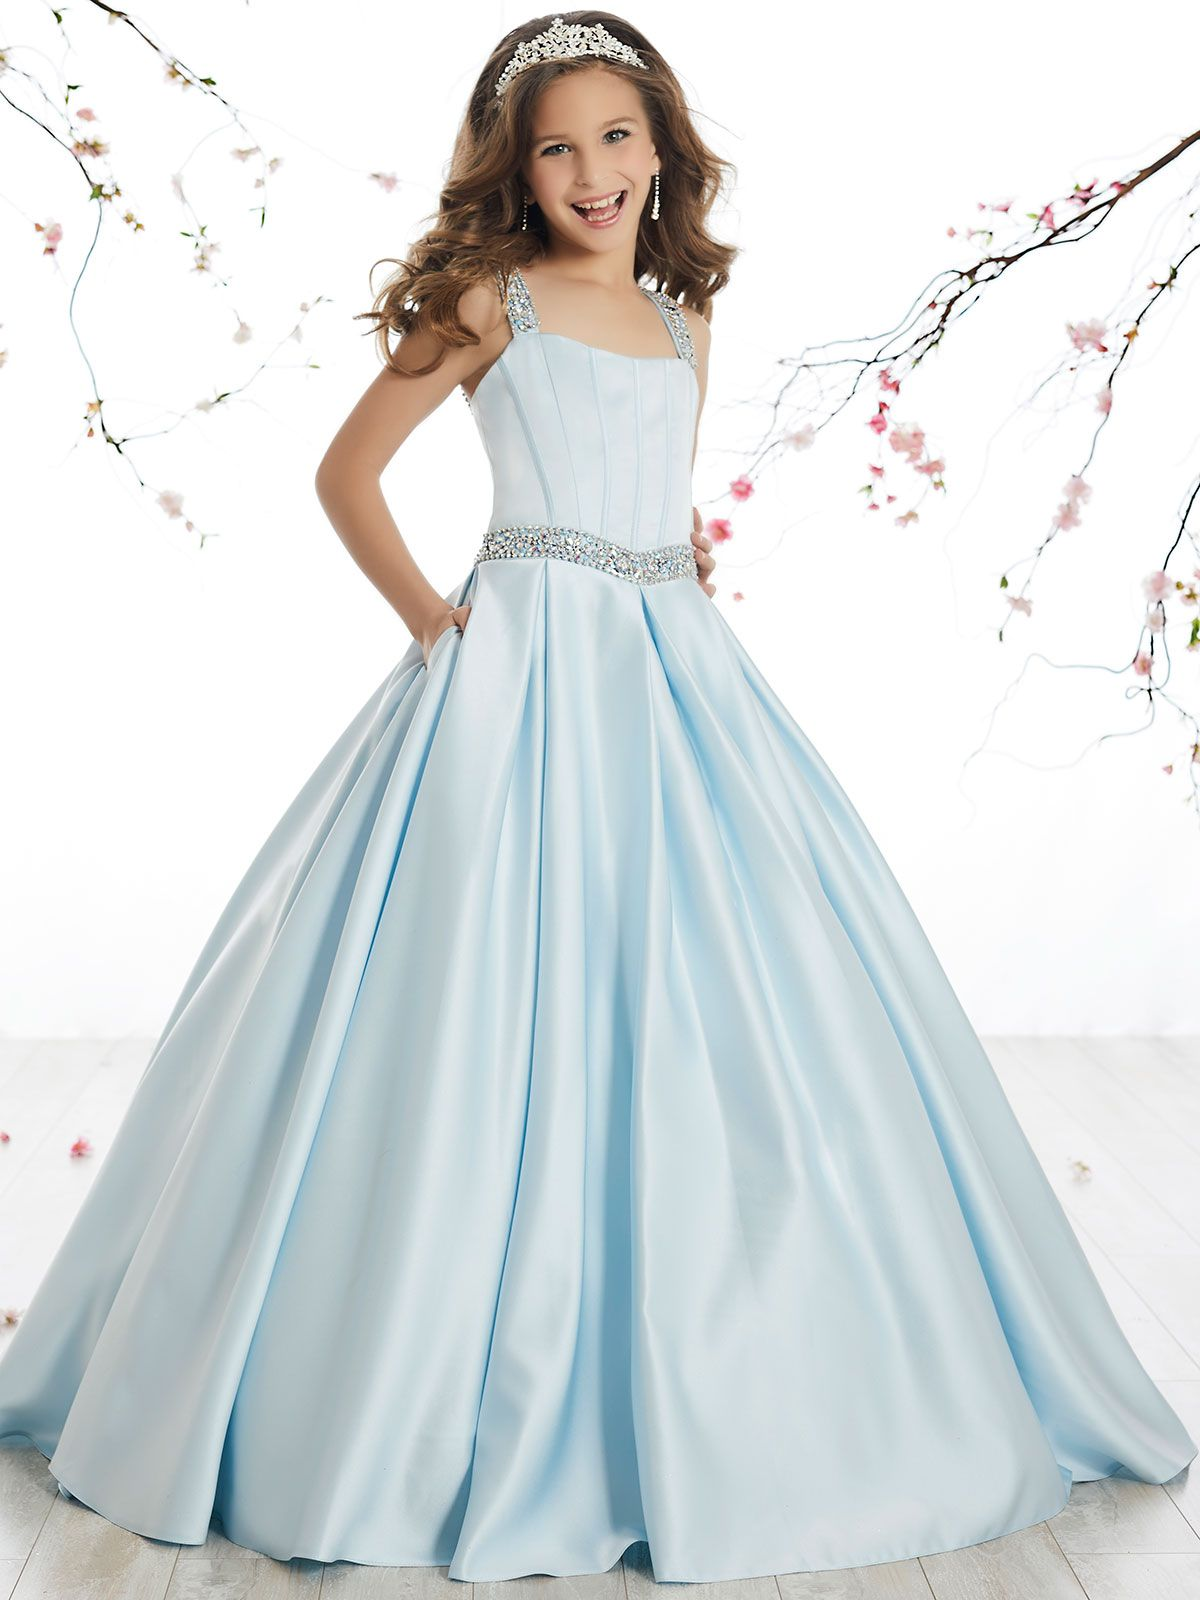 b6c4cd99341 Tiffany Princes 13510 Scoop Neckline Pageant Dress